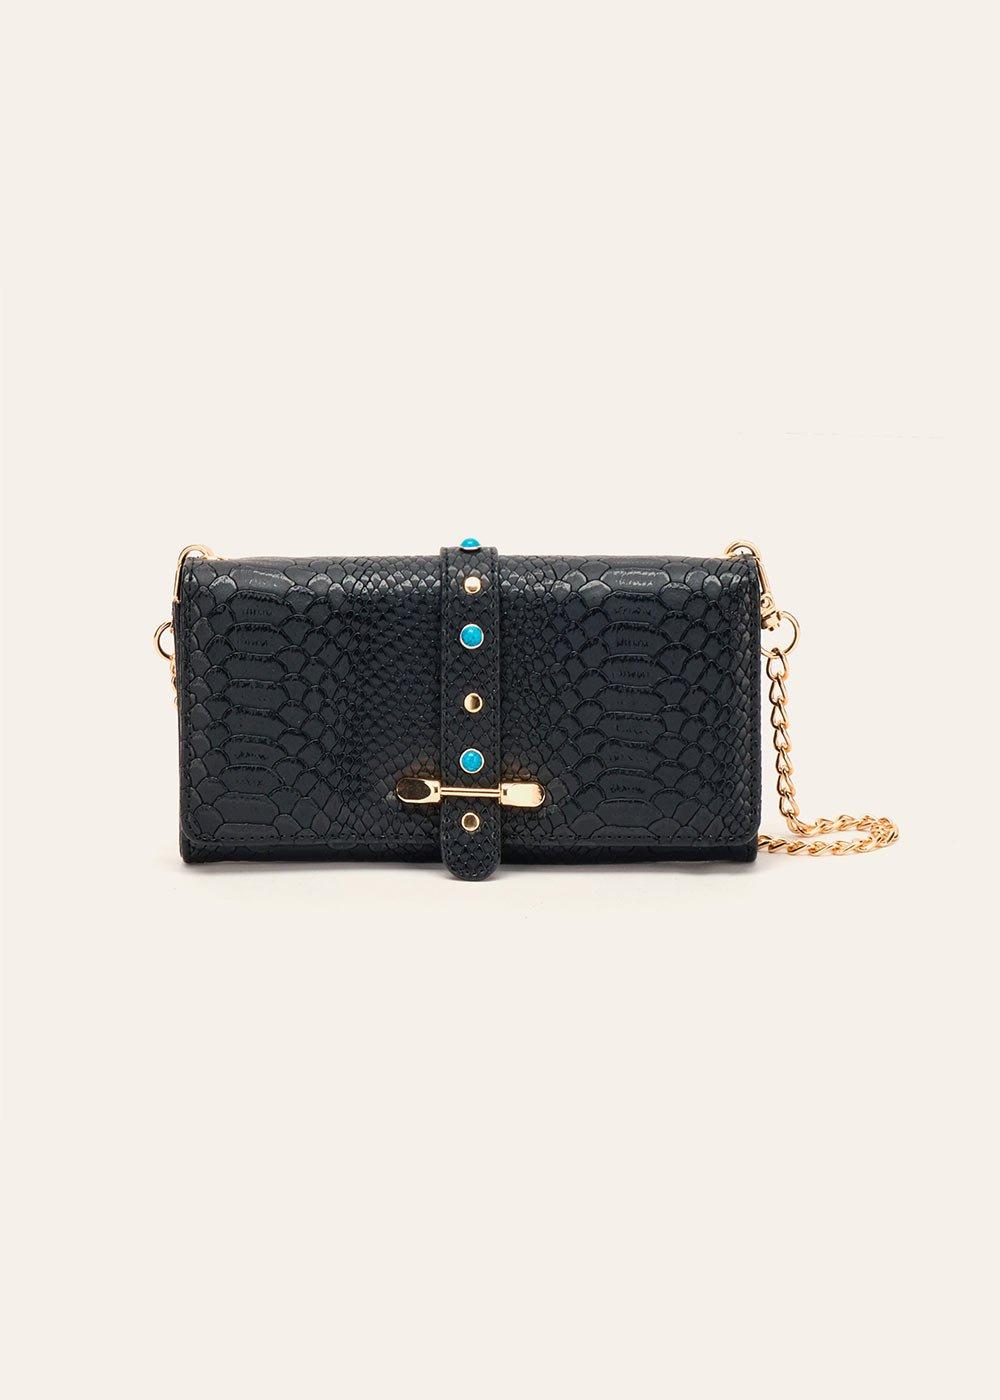 Paloma wallet with shoulder strap - Black - Woman